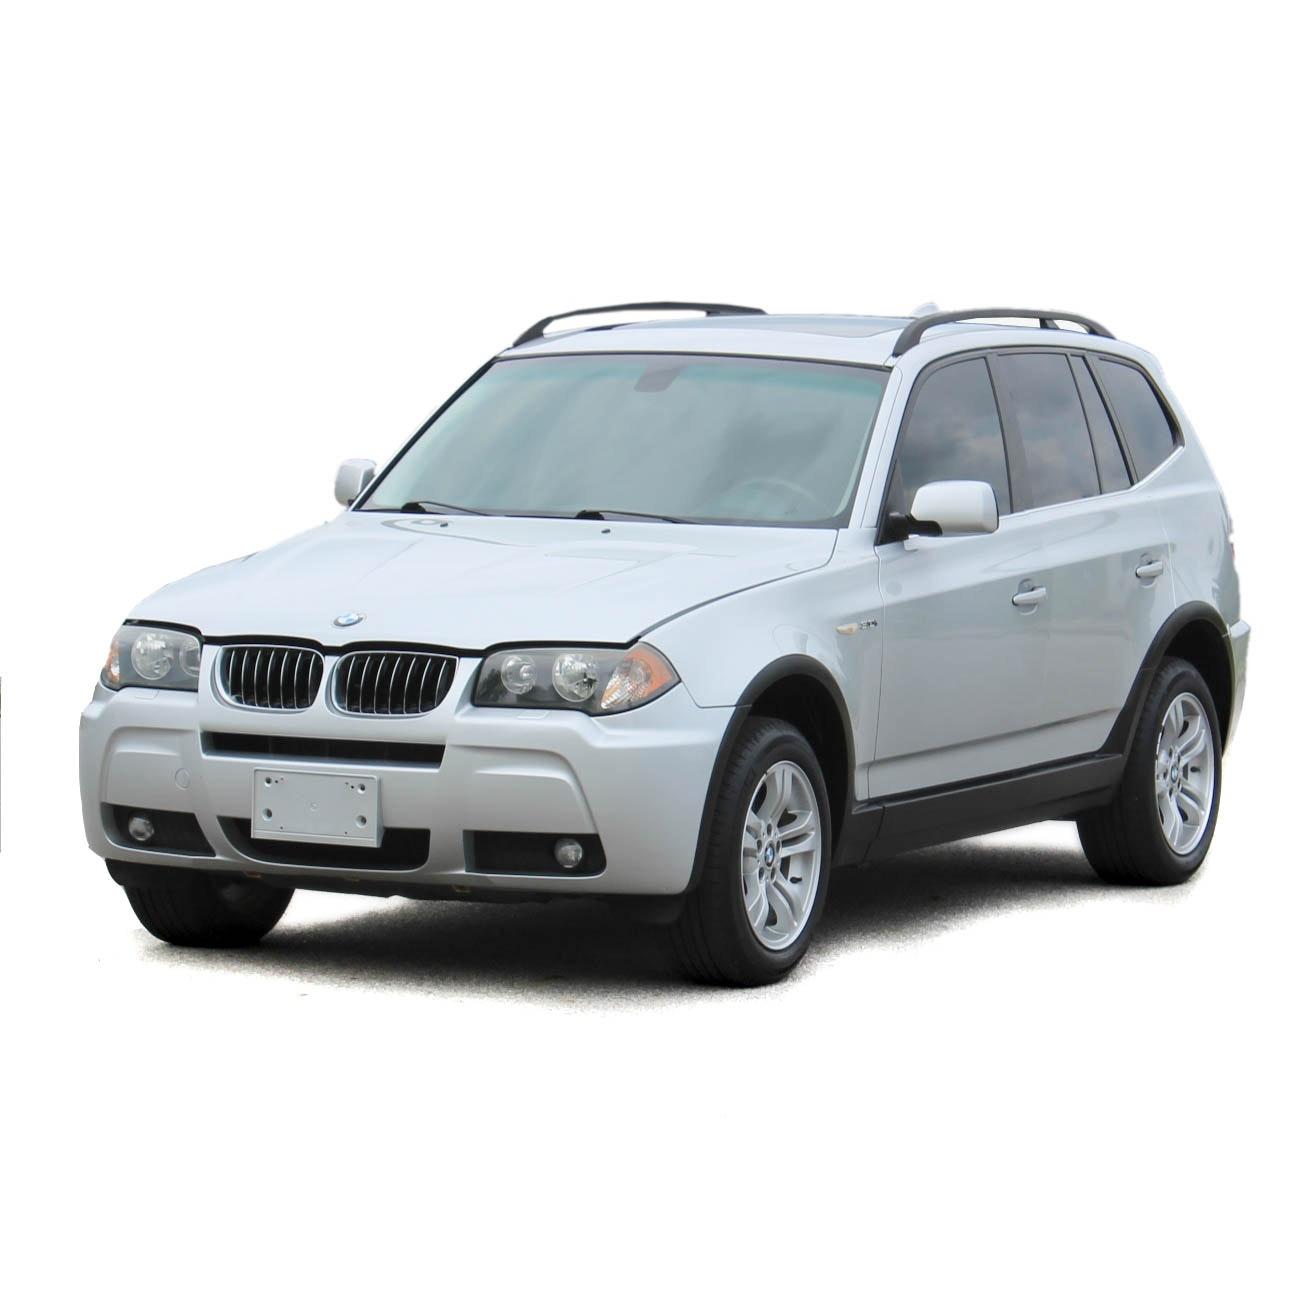 2006 BMW X3 Crossover SUV